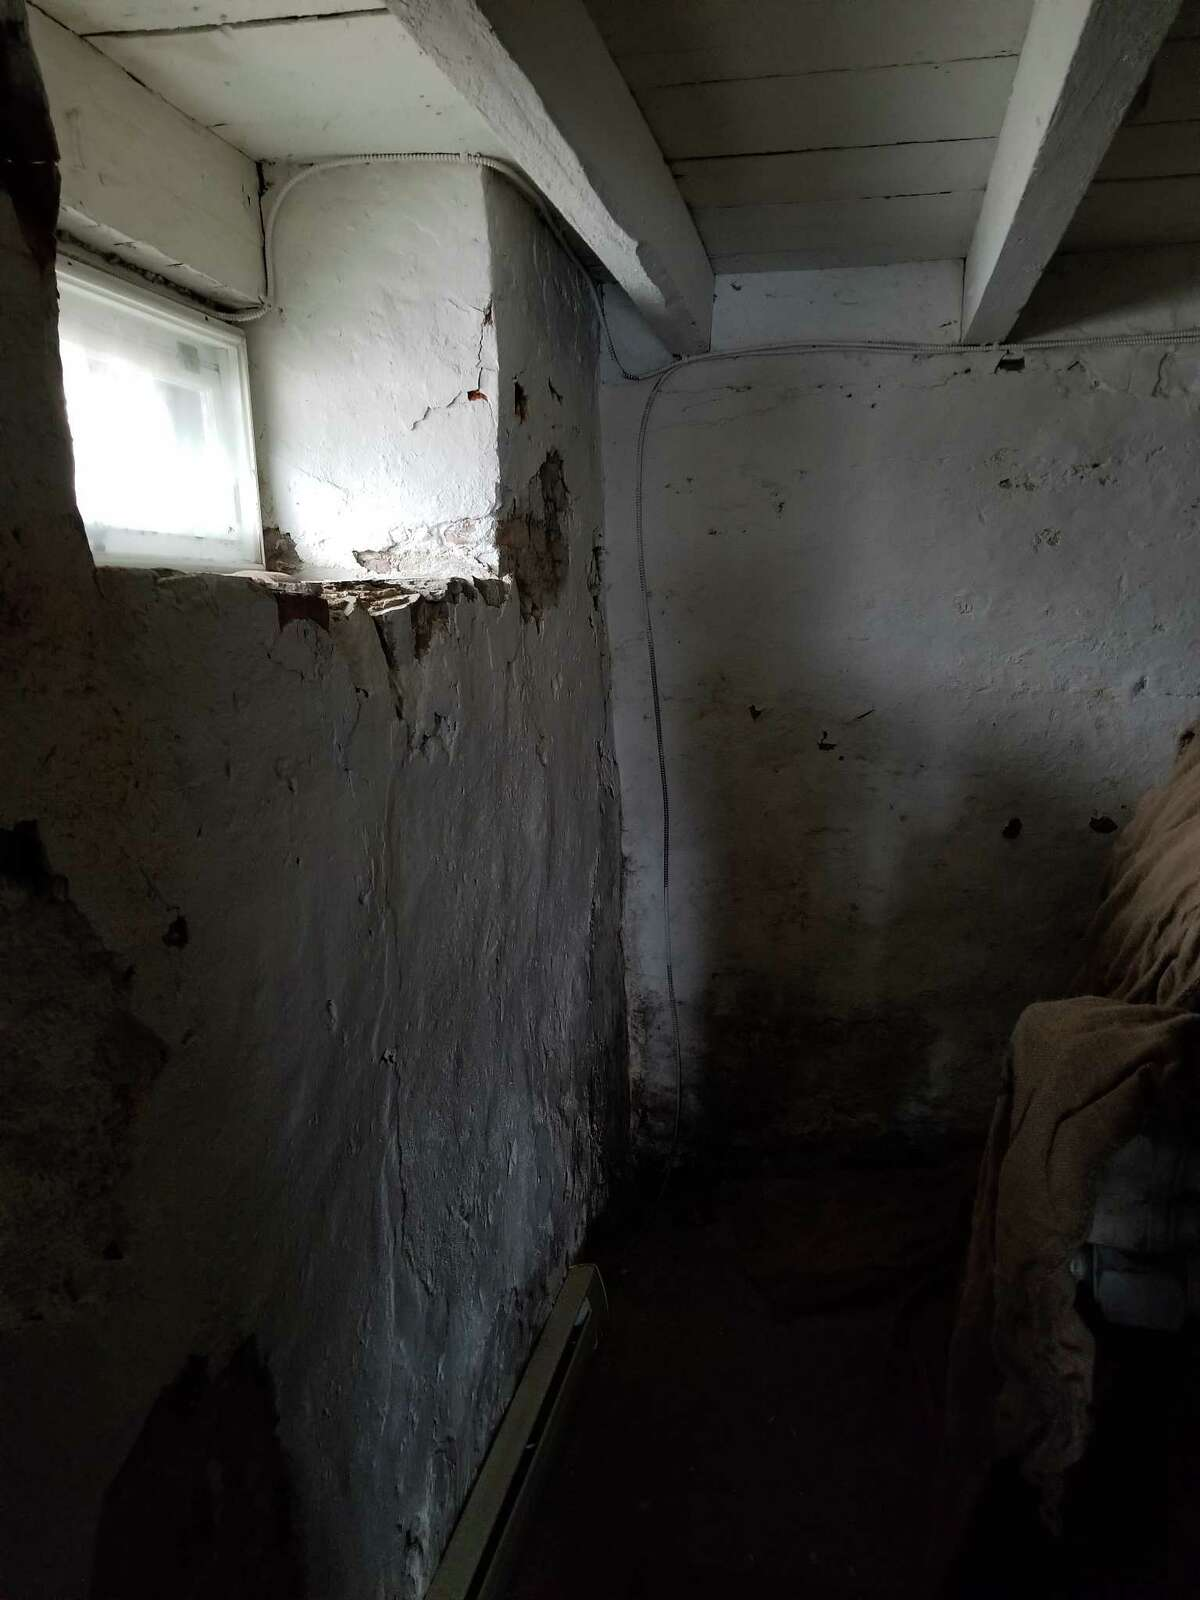 Dinah Jackson's basement room at Cherry Hill (photo courtesy Deborah Emmons-Andarawis / Historic Cherry Hill)